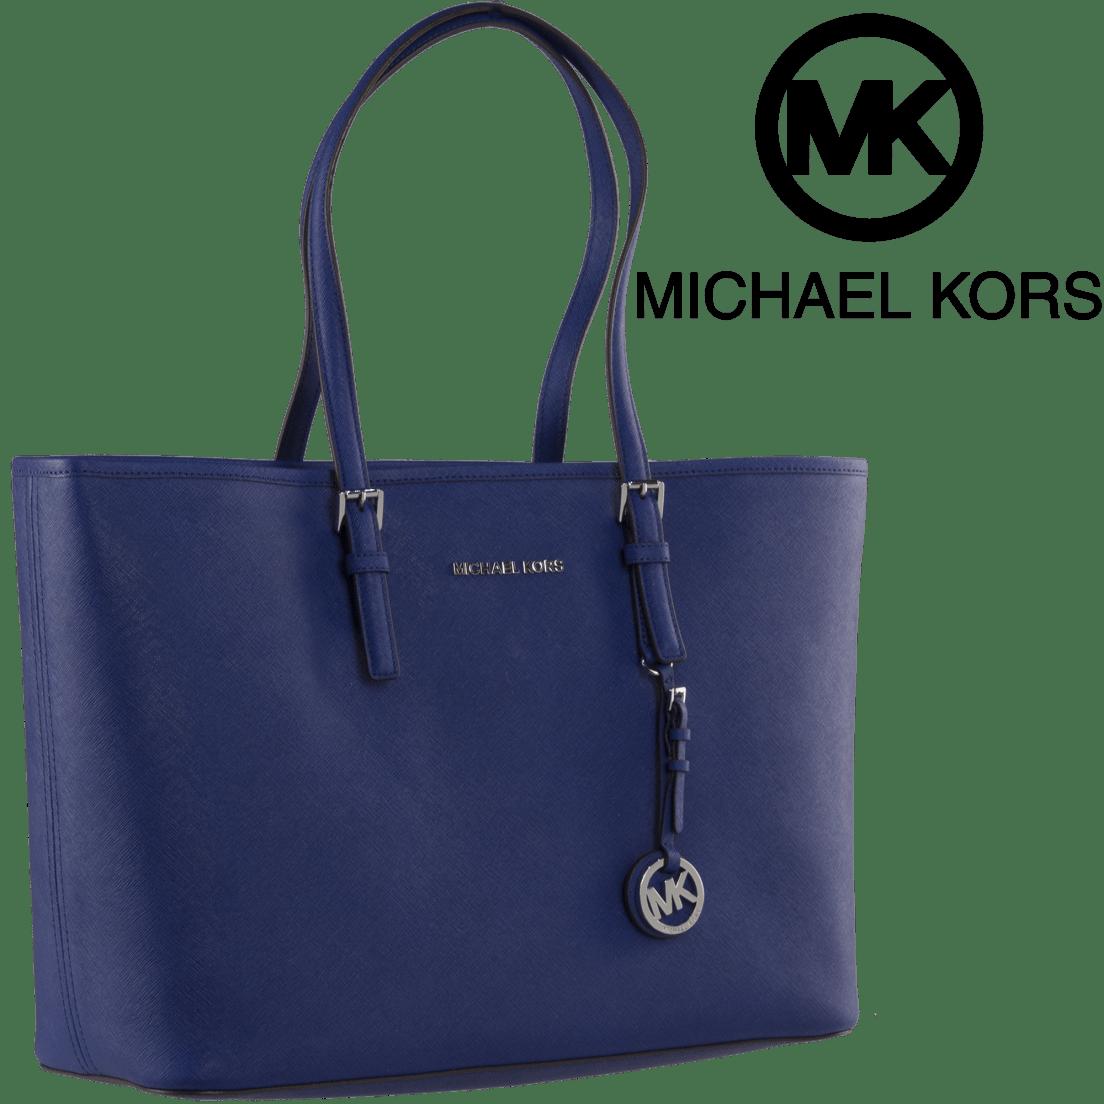 7da4ce862f4f Michael Kors Jet Set Travel Medium Saffiano Leather Top-Zip Tote in Blue